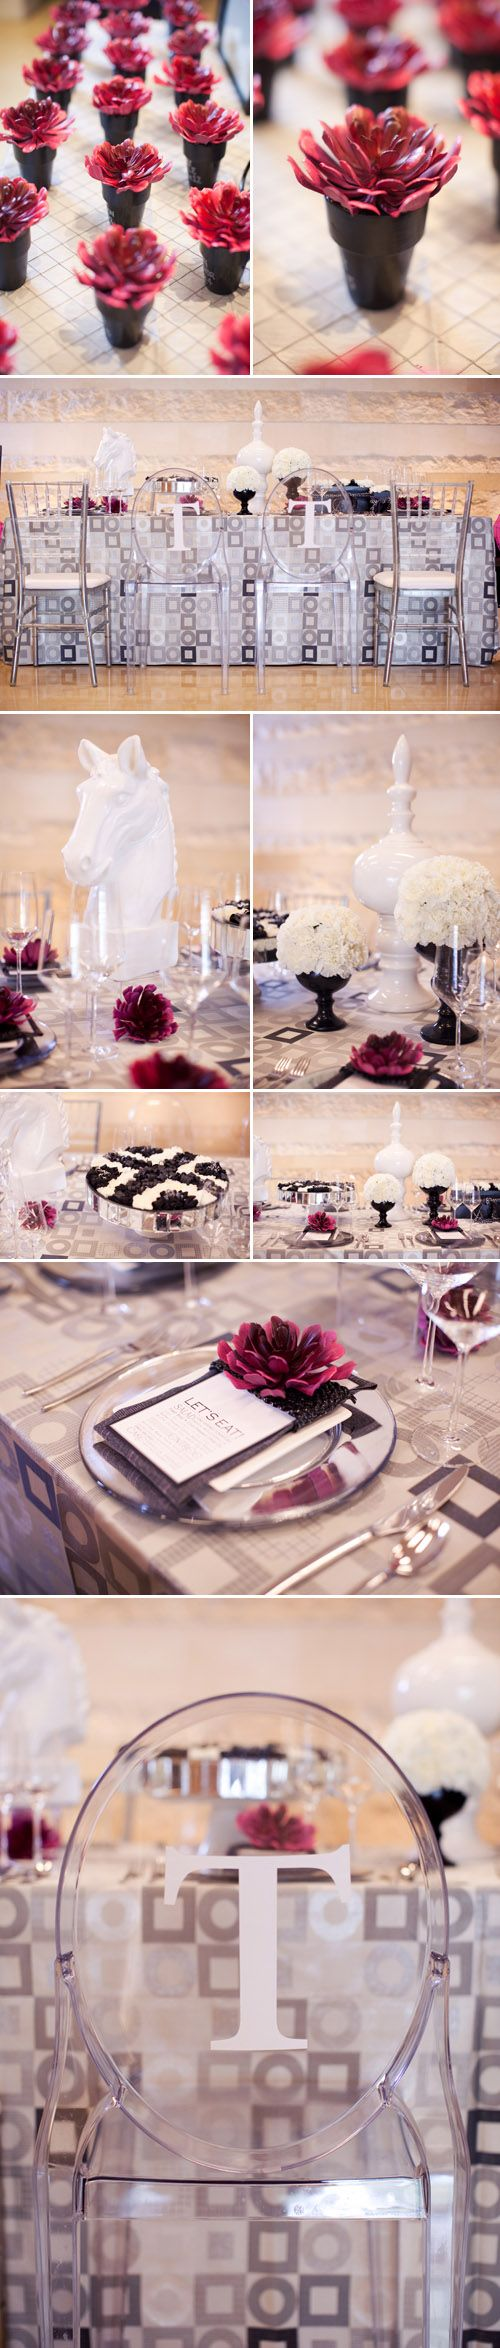 Stylish Modern Wedding Inspiration Photo Shoot Wedding Styles